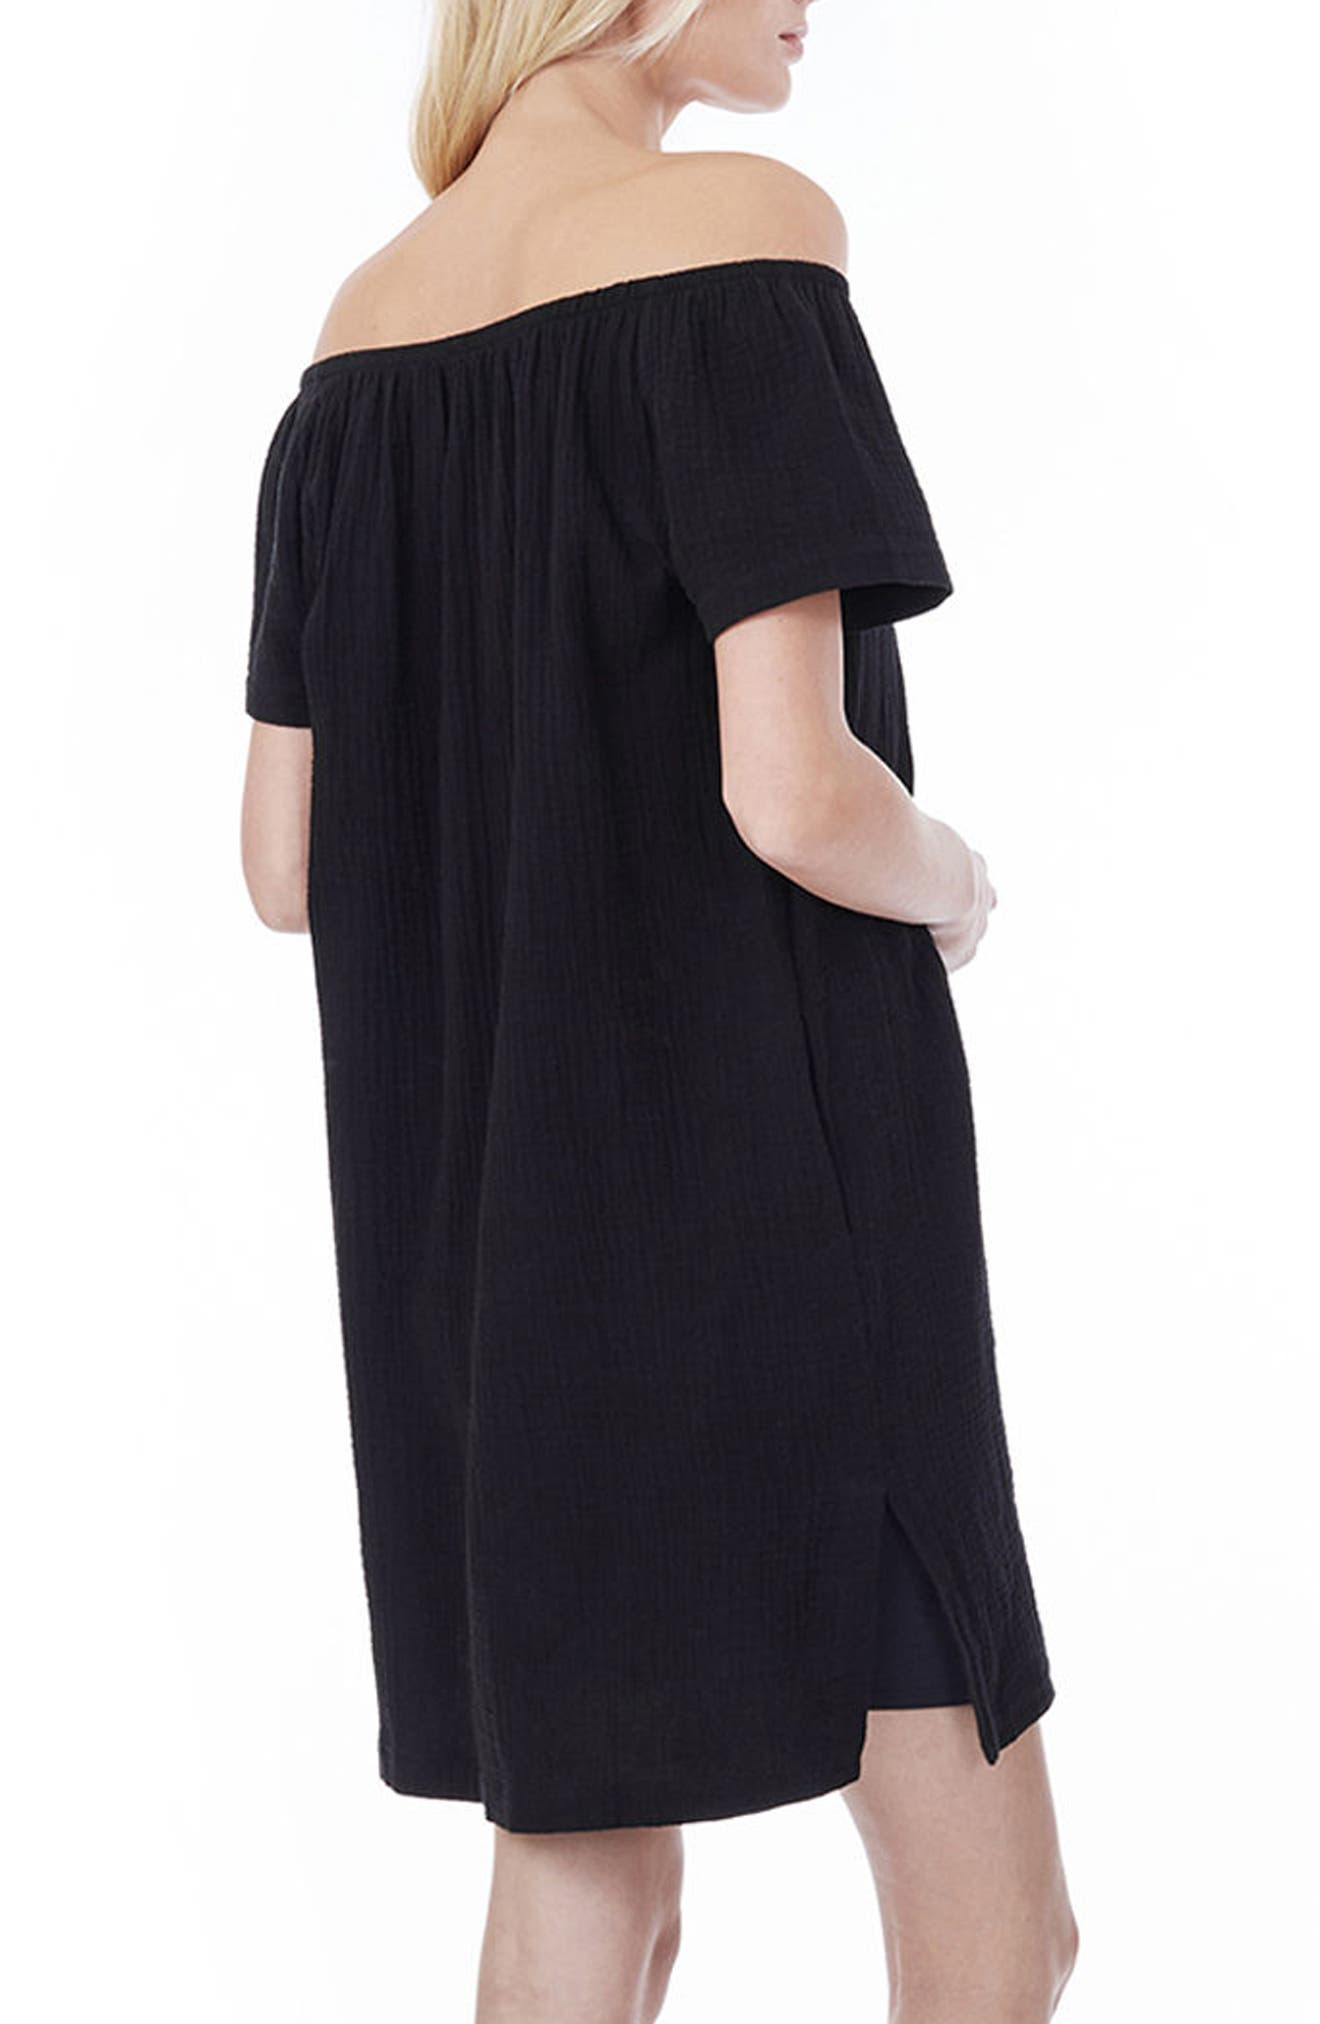 LOYAL HANA, Ariel Off The Shoulder Maternity/Nursing Dress, Alternate thumbnail 2, color, BLACK